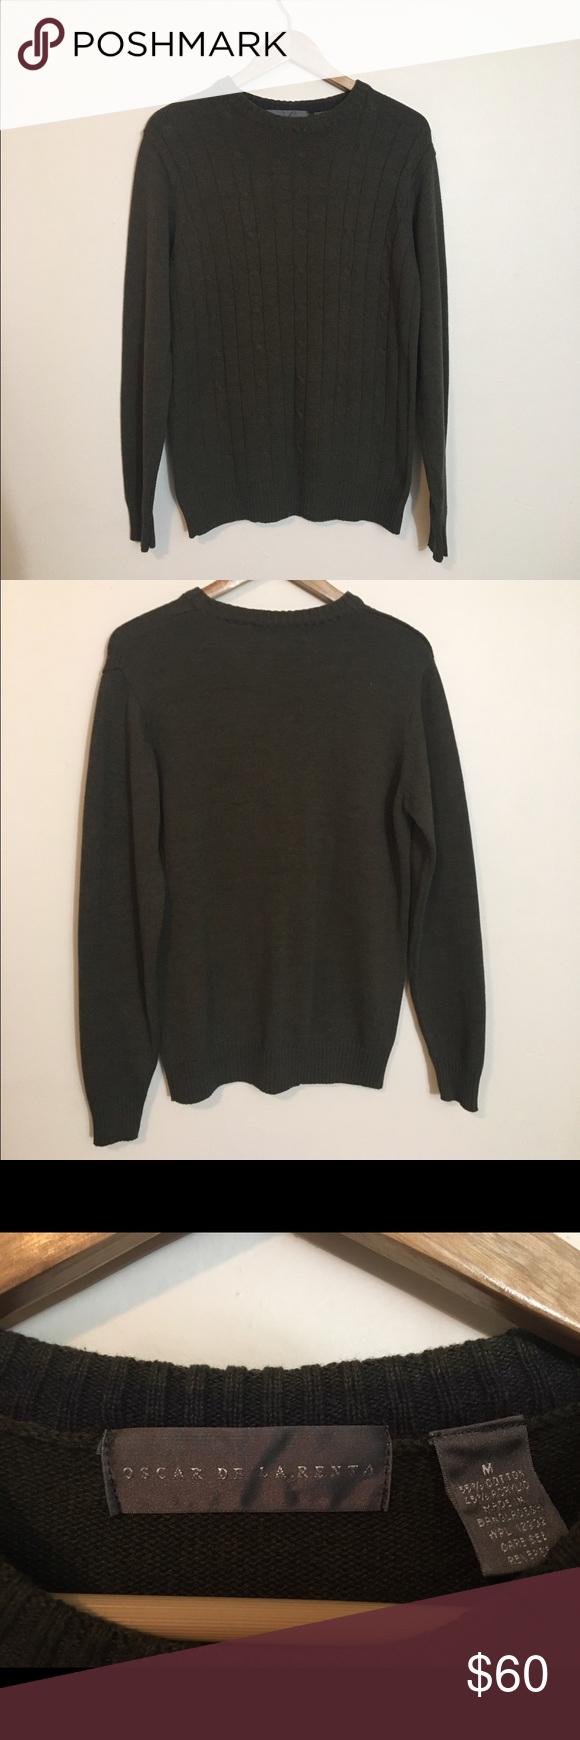 Oscar de la Renta Cable Sweater Olive green Oscar De La Renta Sweater. Oscar de la Renta Tops